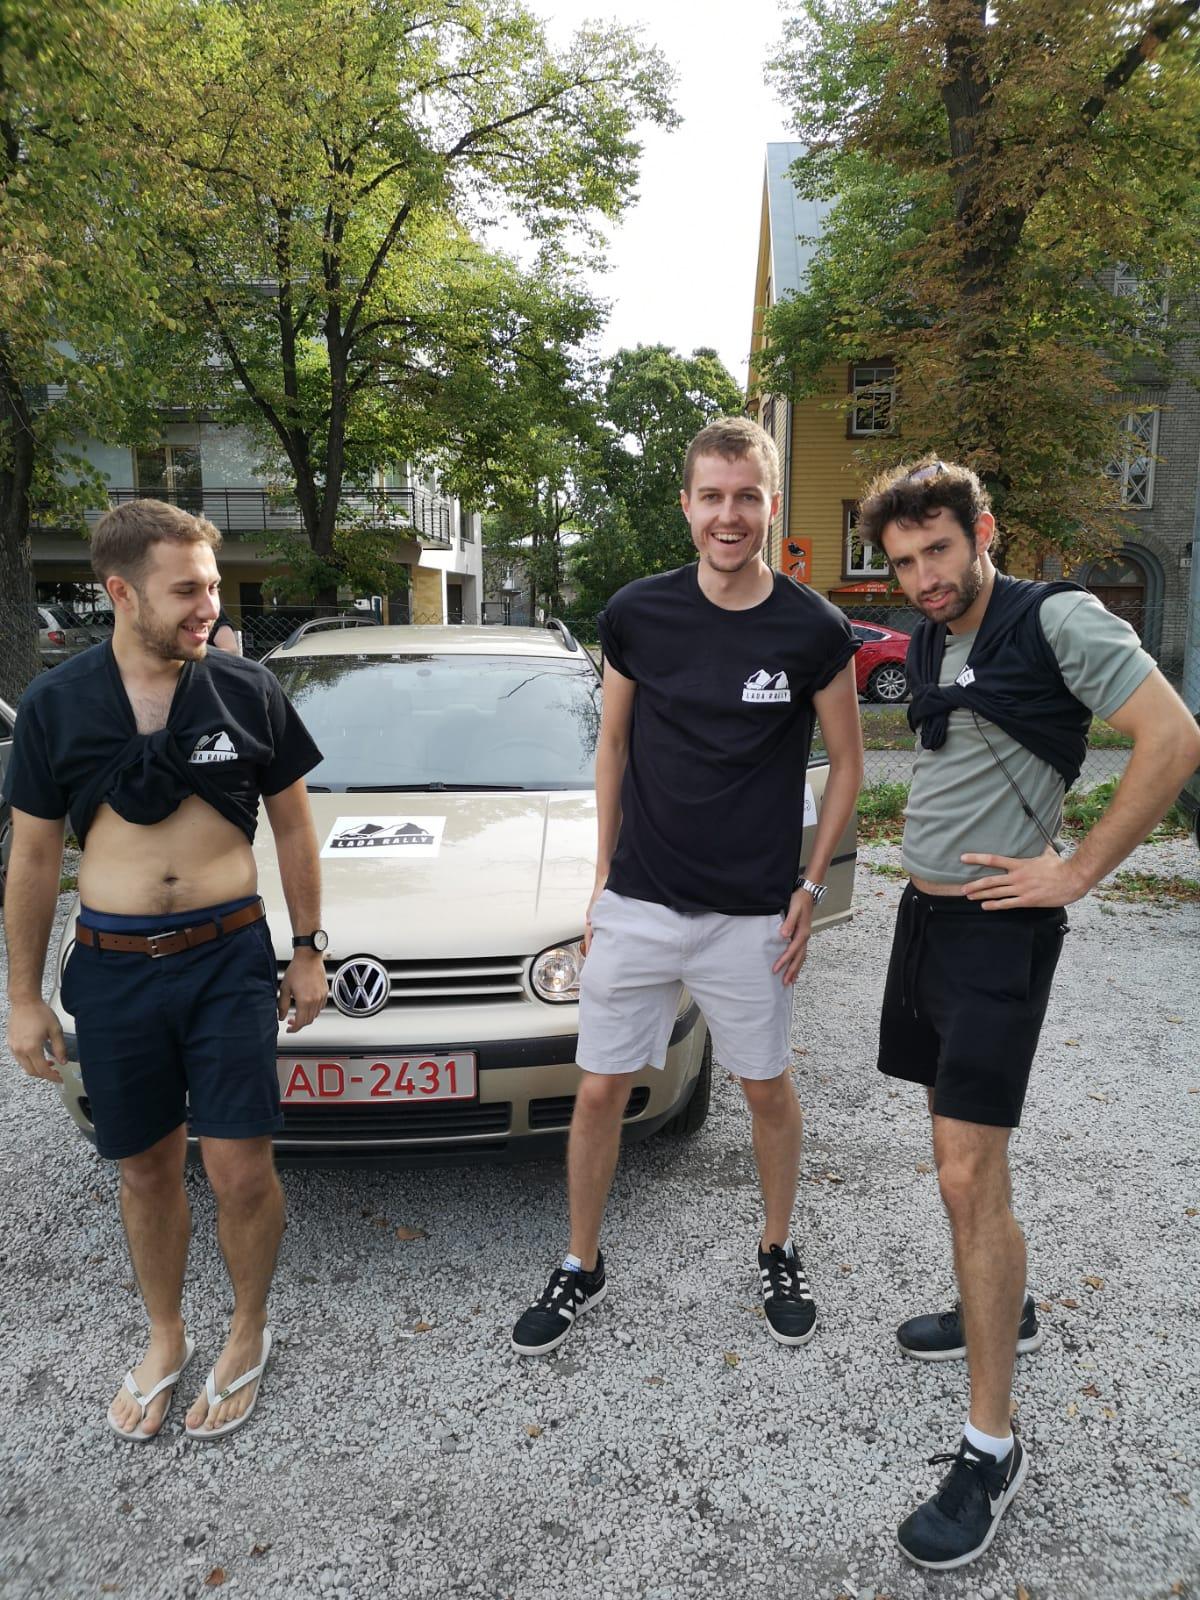 3rd - I'm Tallinn You - Ed, Tom, Max